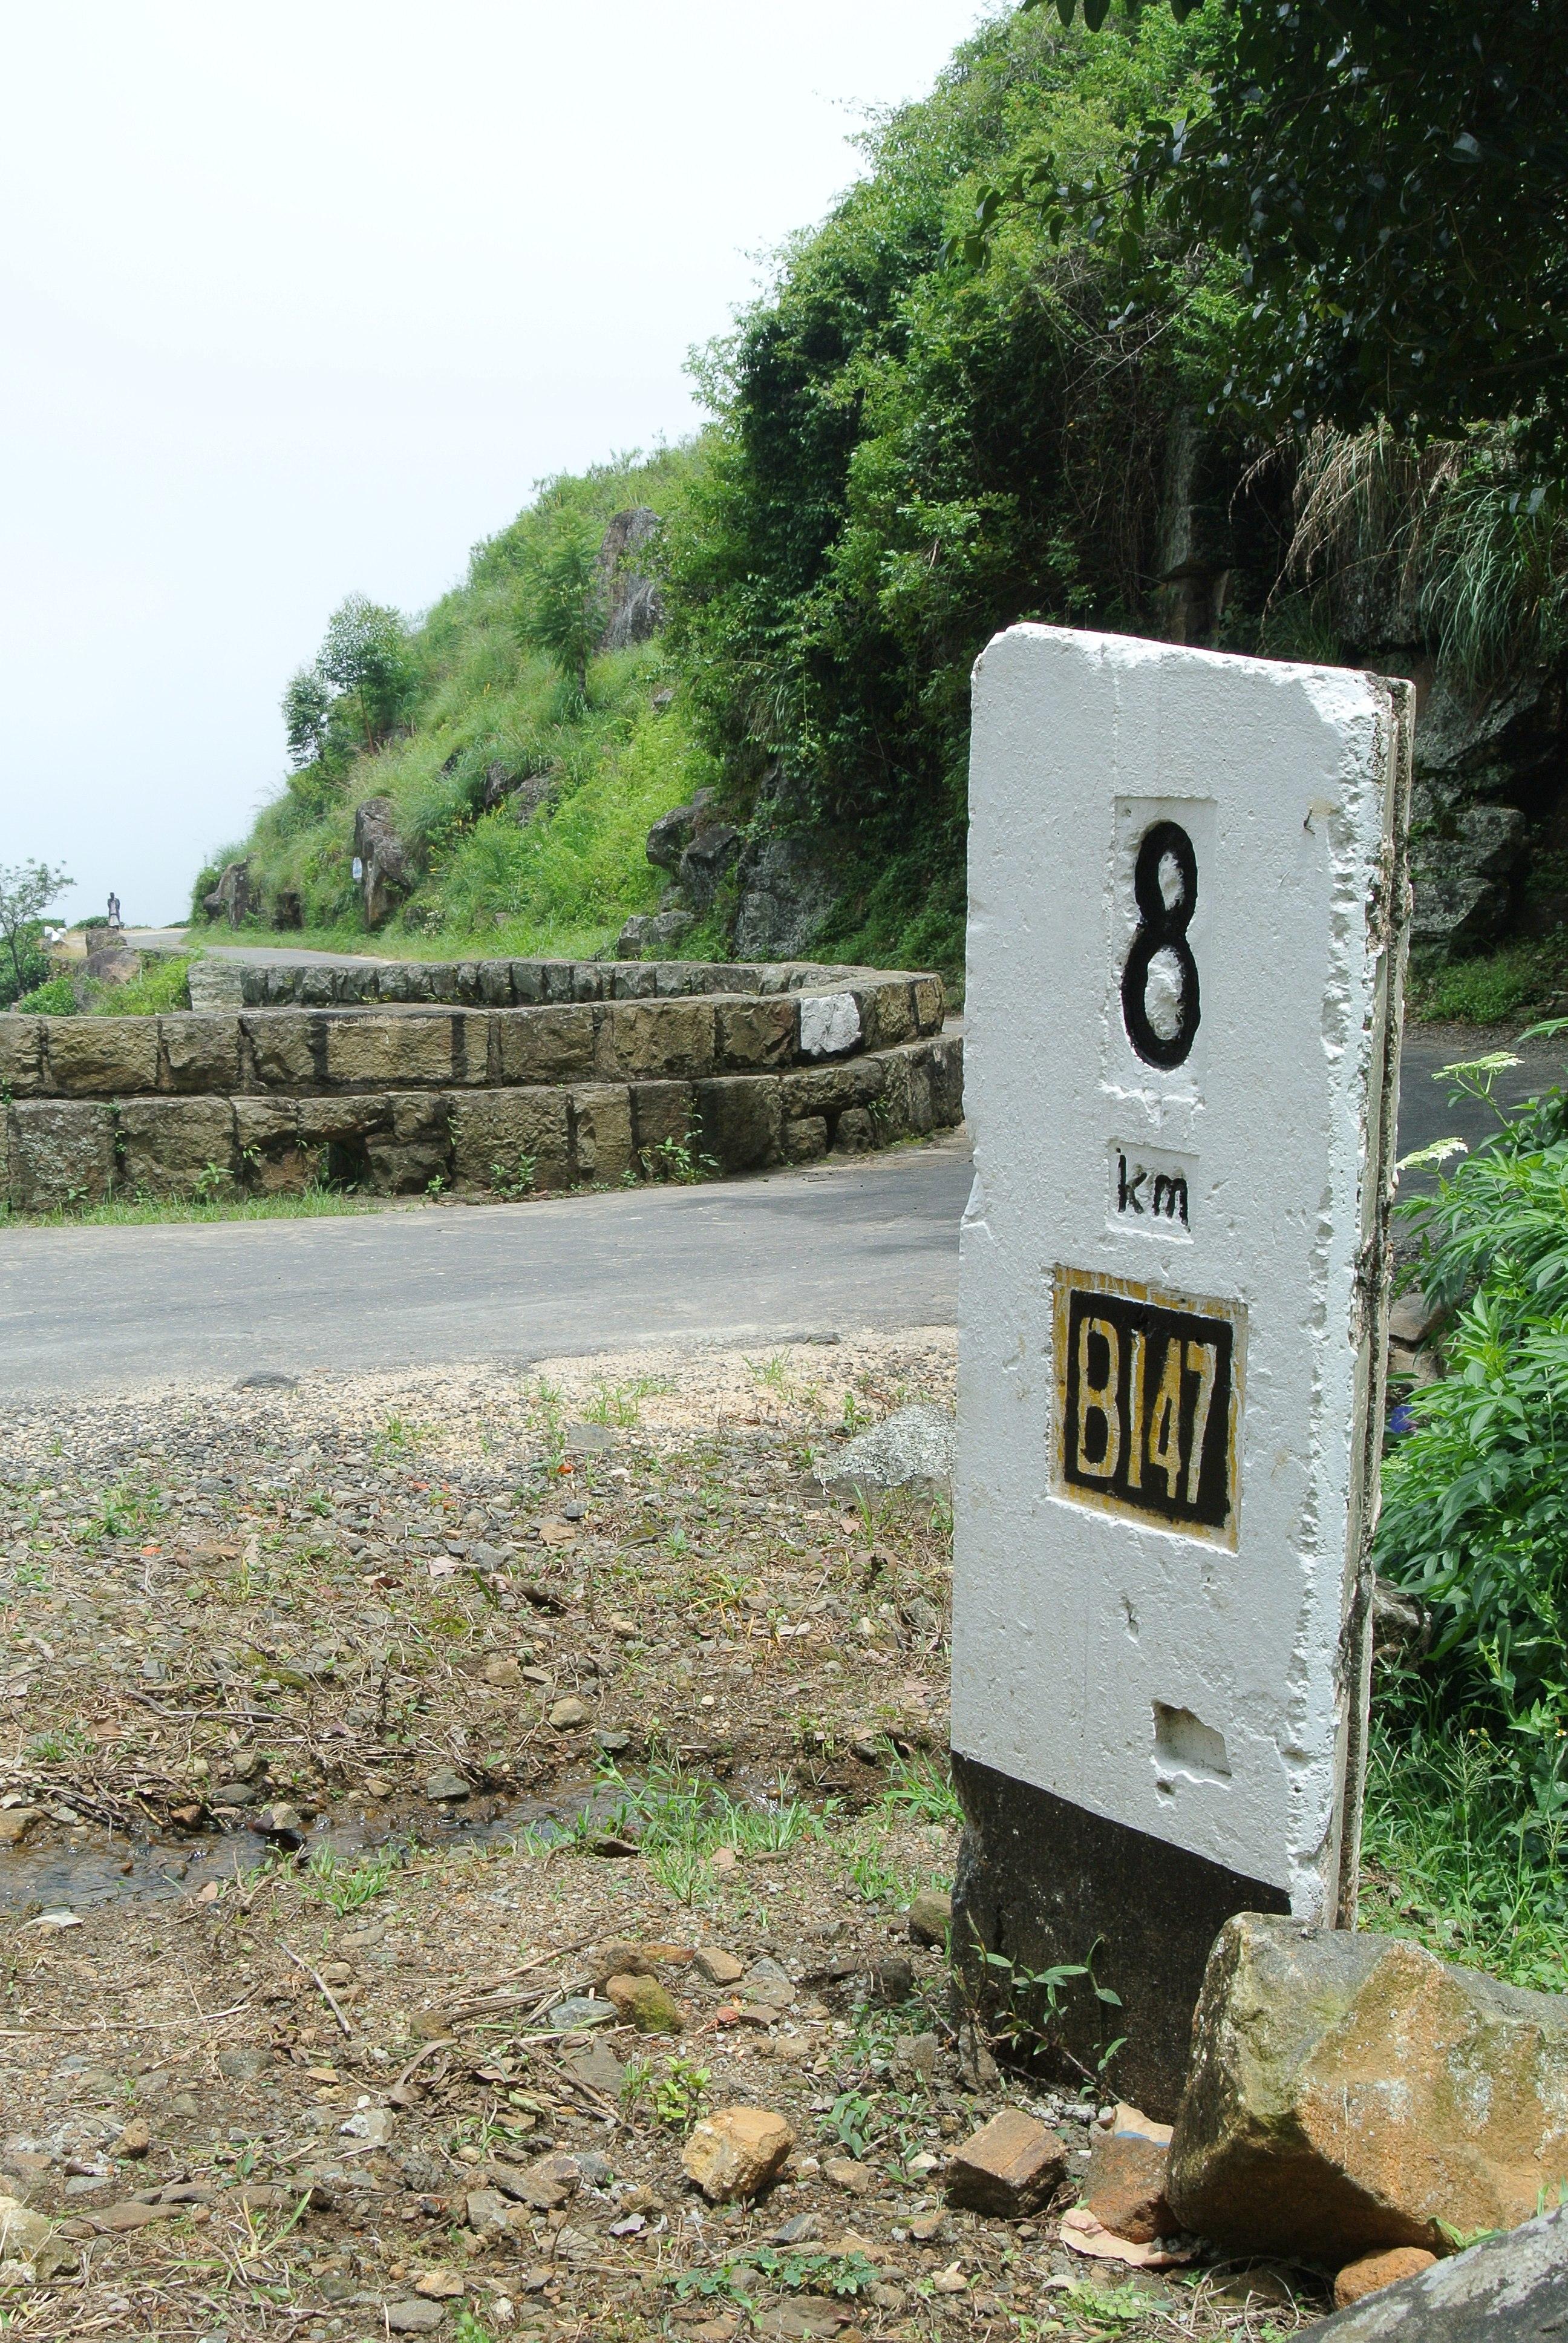 File:Marker on Highway B147 in Sri Lanka JPG - Wikimedia Commons